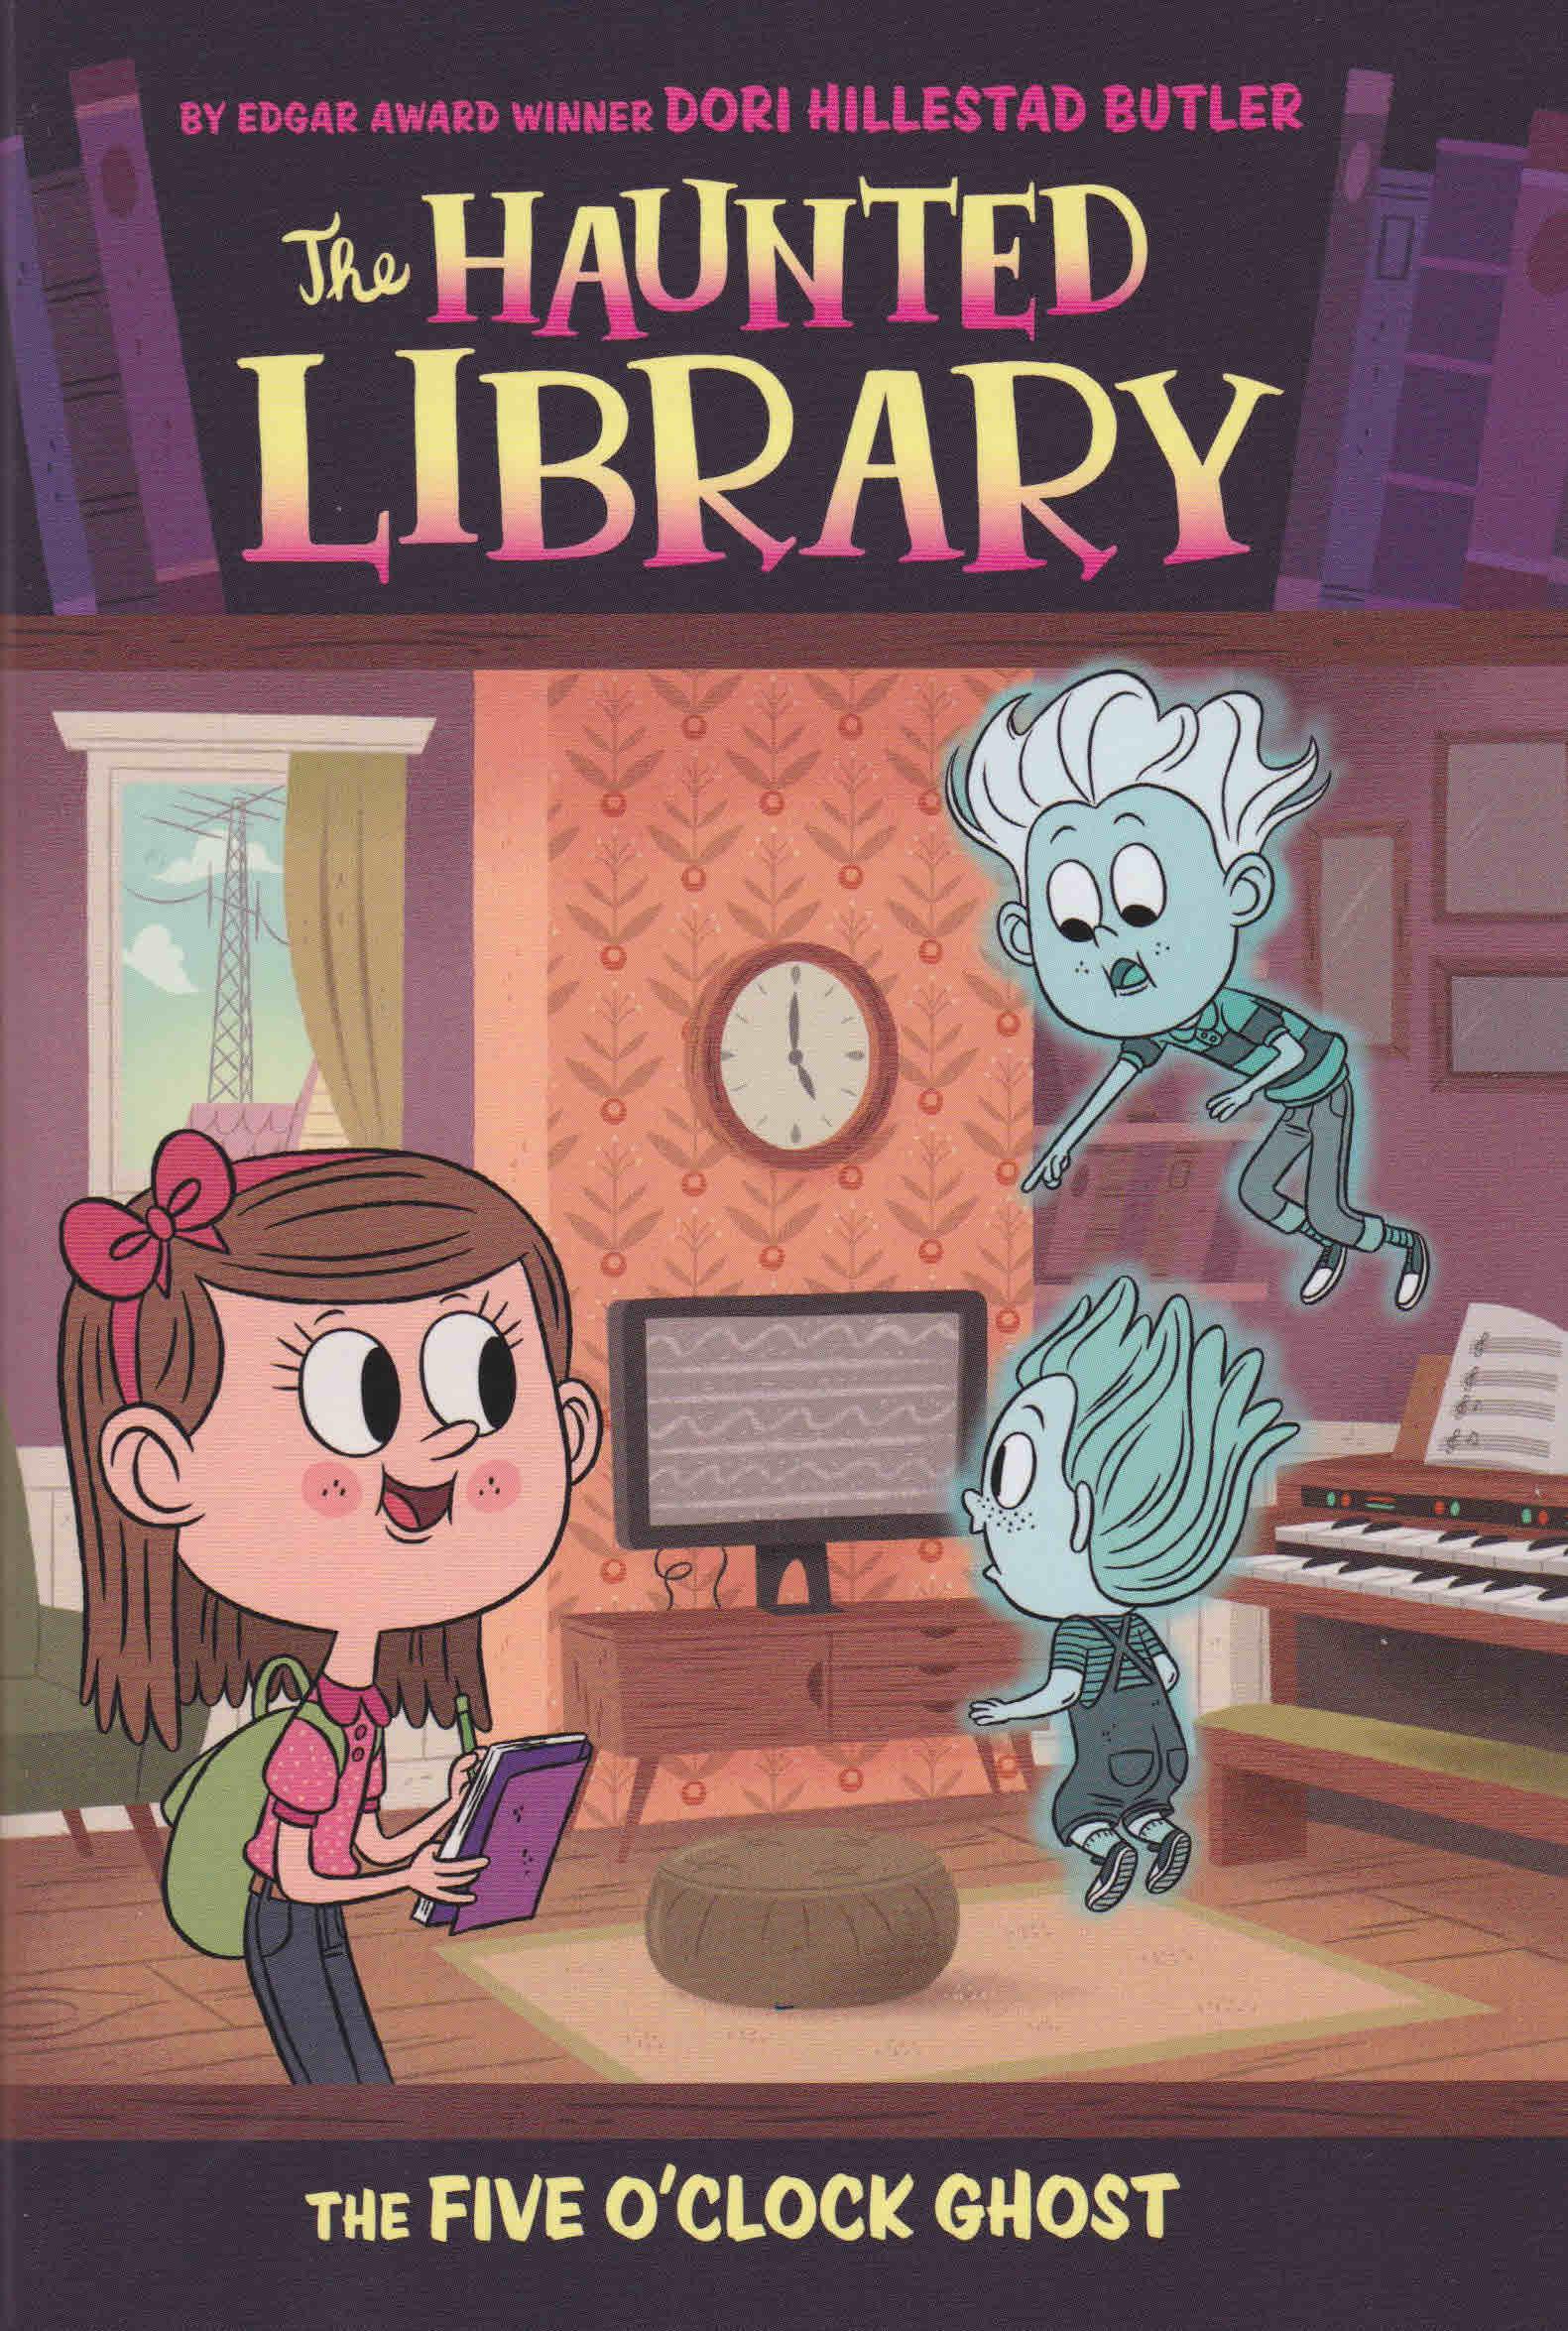 The Haunted Library  Dori Hillestad Butler